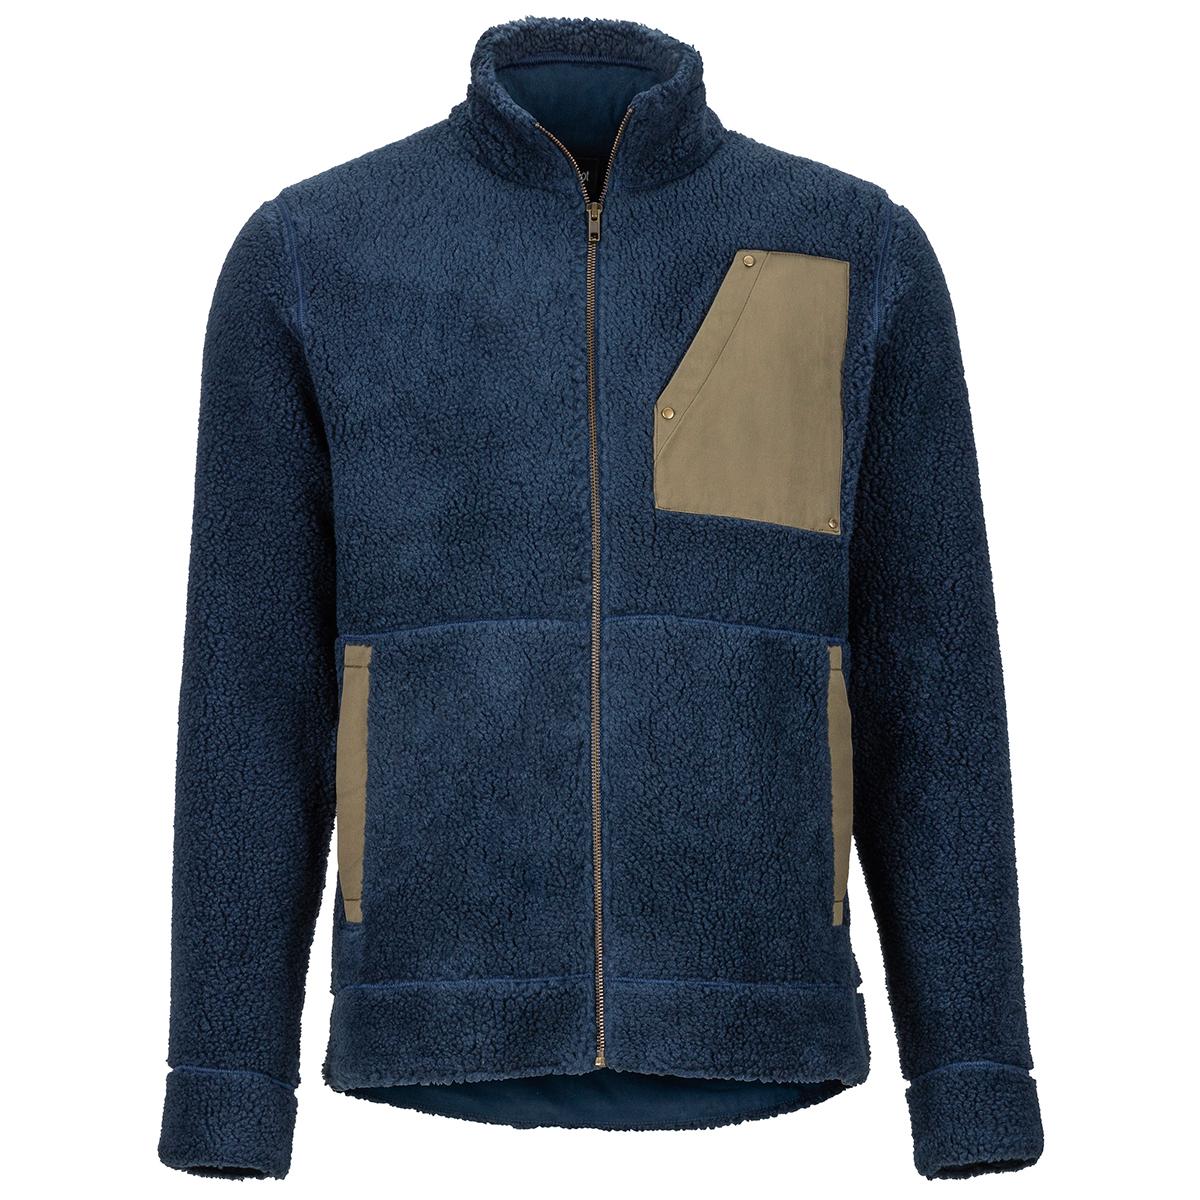 Marmot Men's Larson Jacket - Blue, M